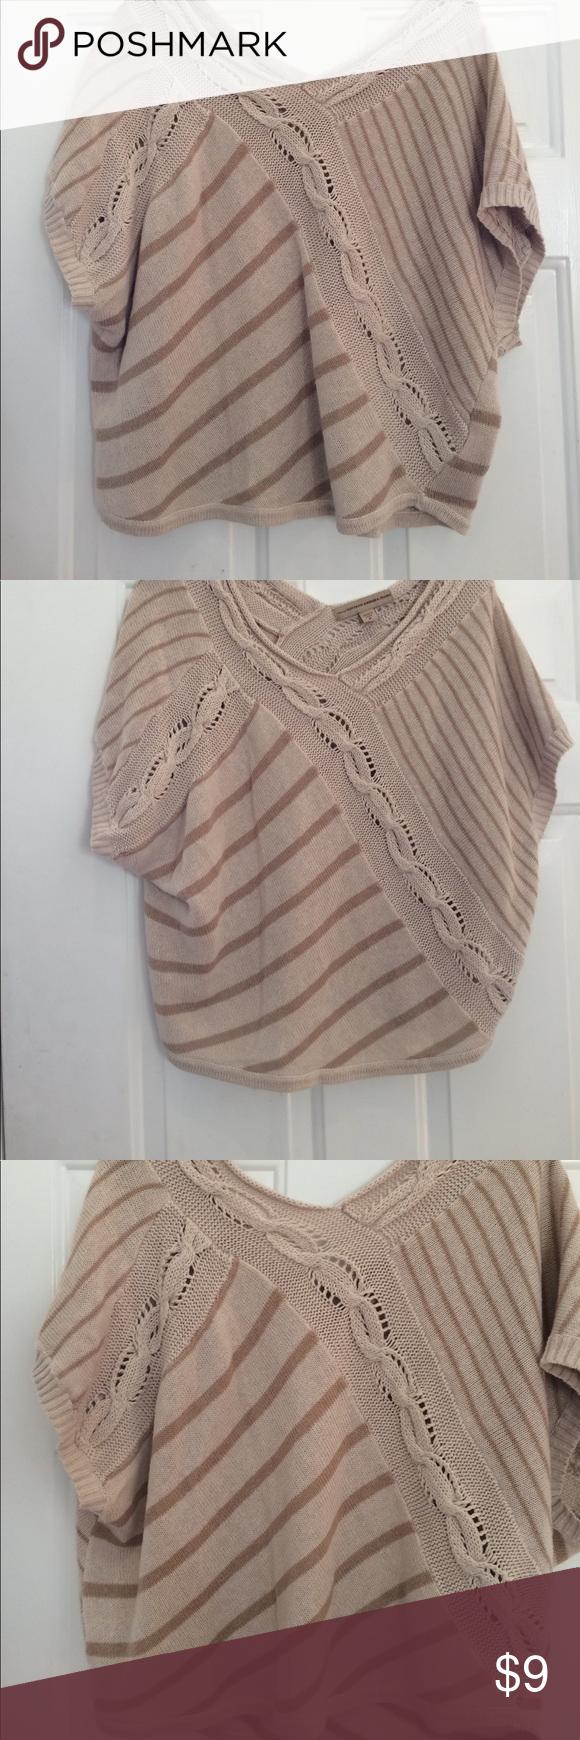 New Ladies Sweater Size Medium Tan New without tag ladies tan ...